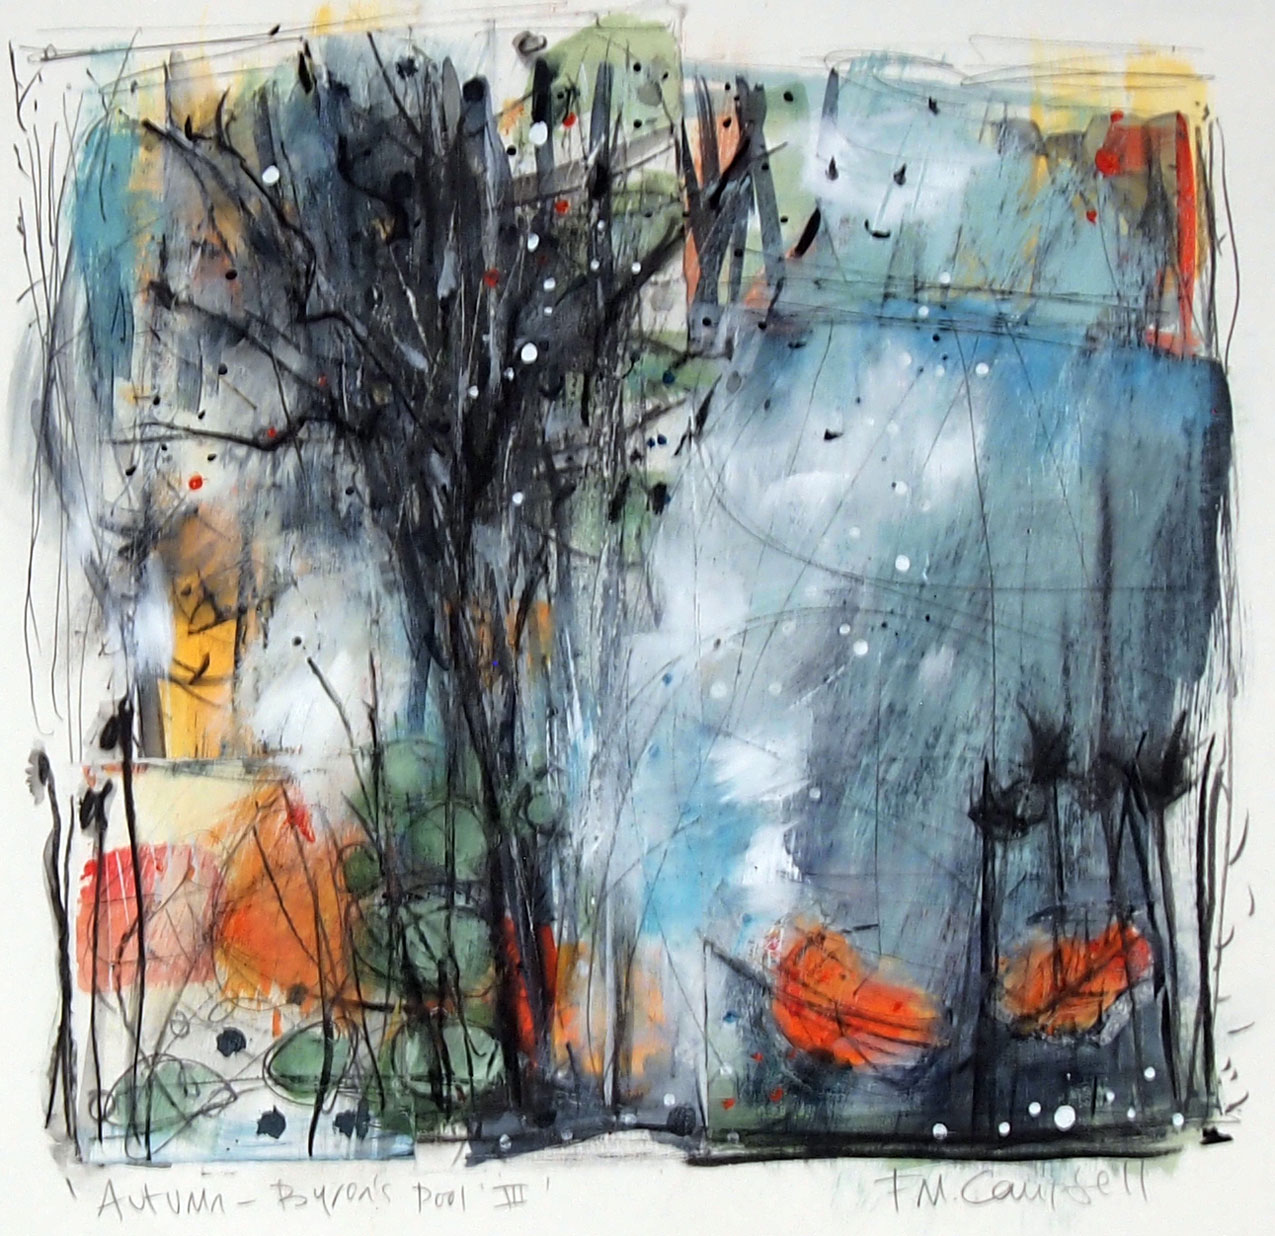 'Autumn - Byron's Pool III'